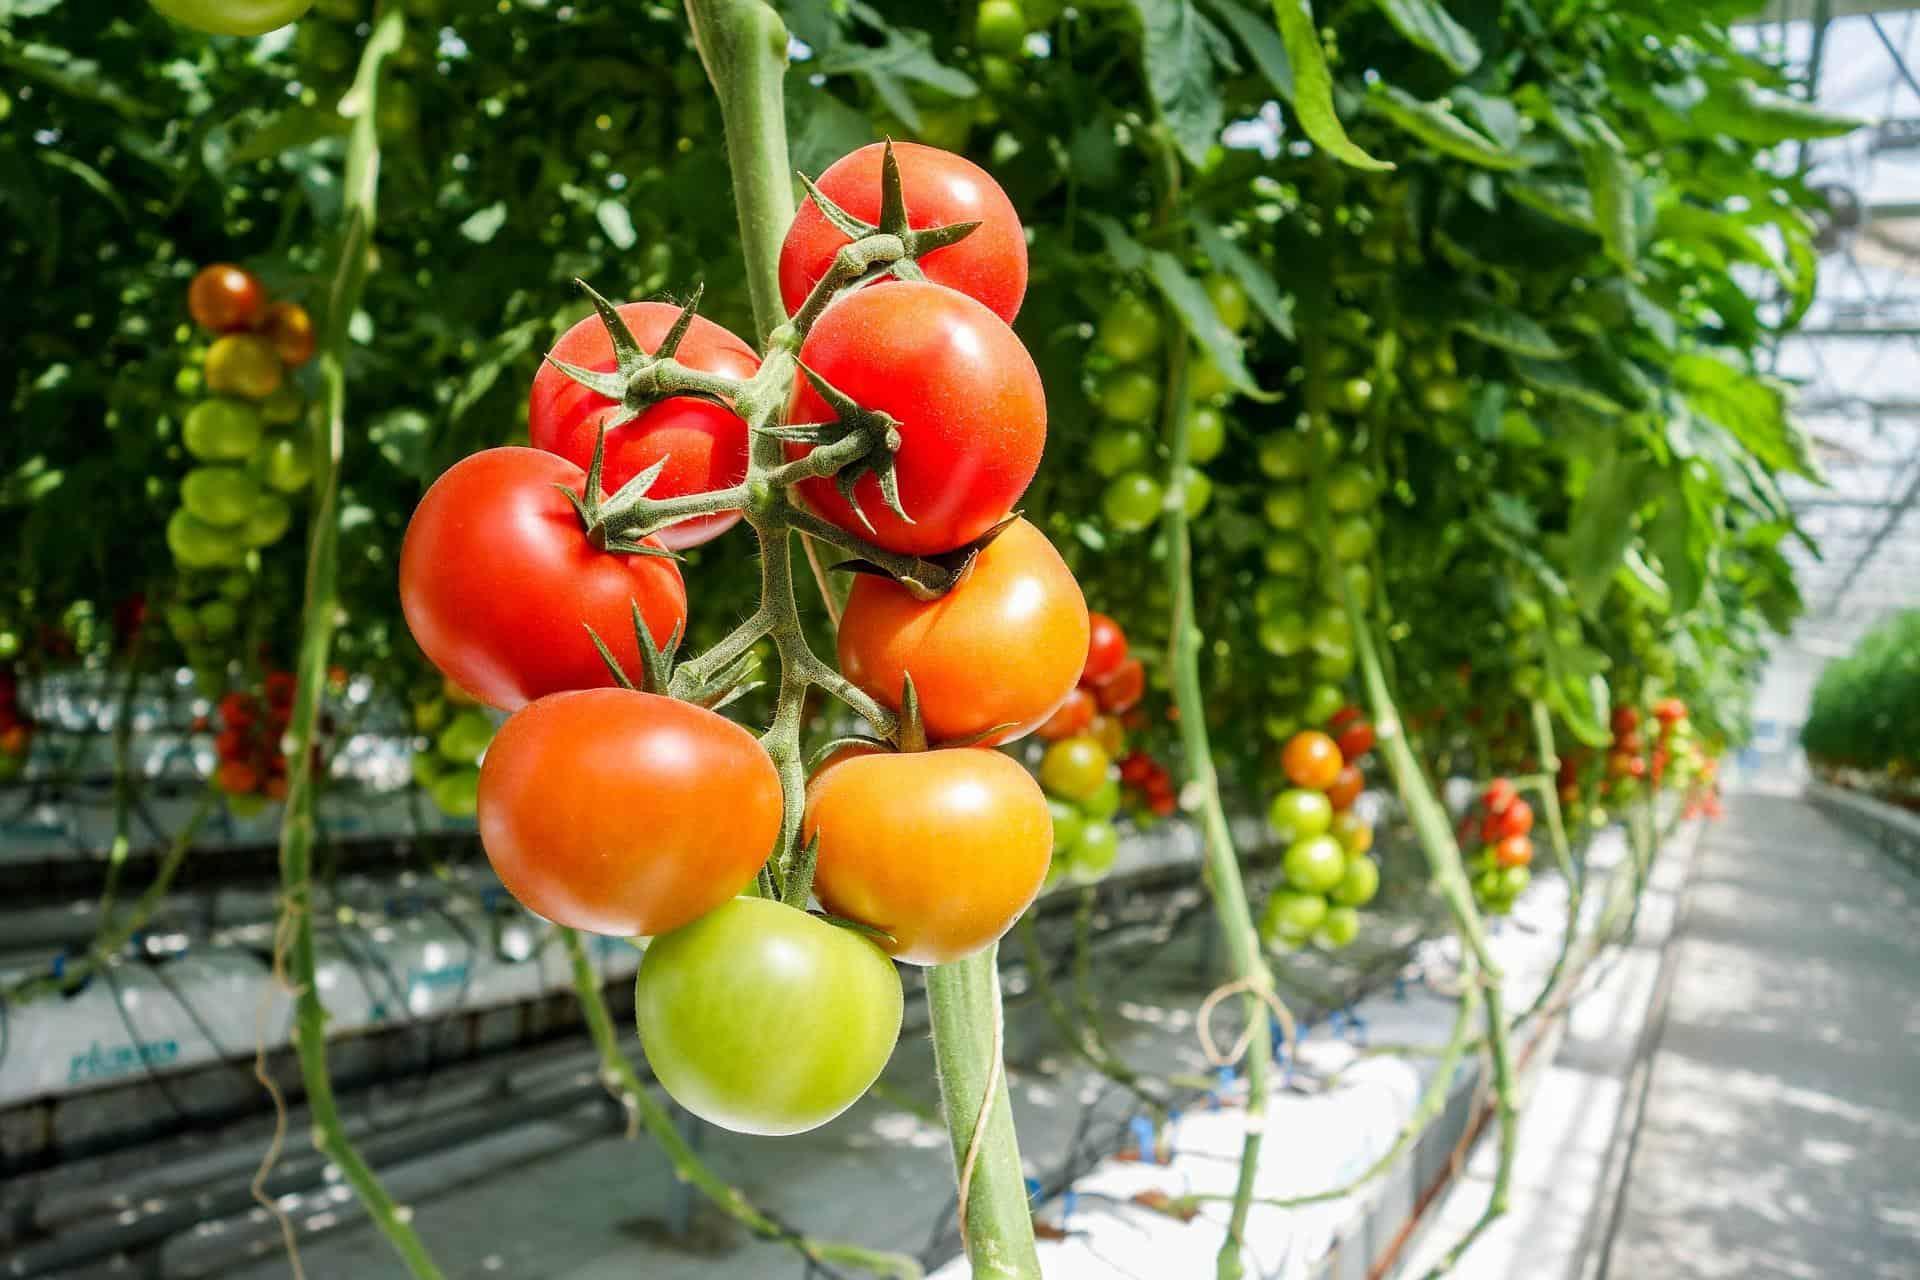 tomato 1310961 1920 - AgroEcosun